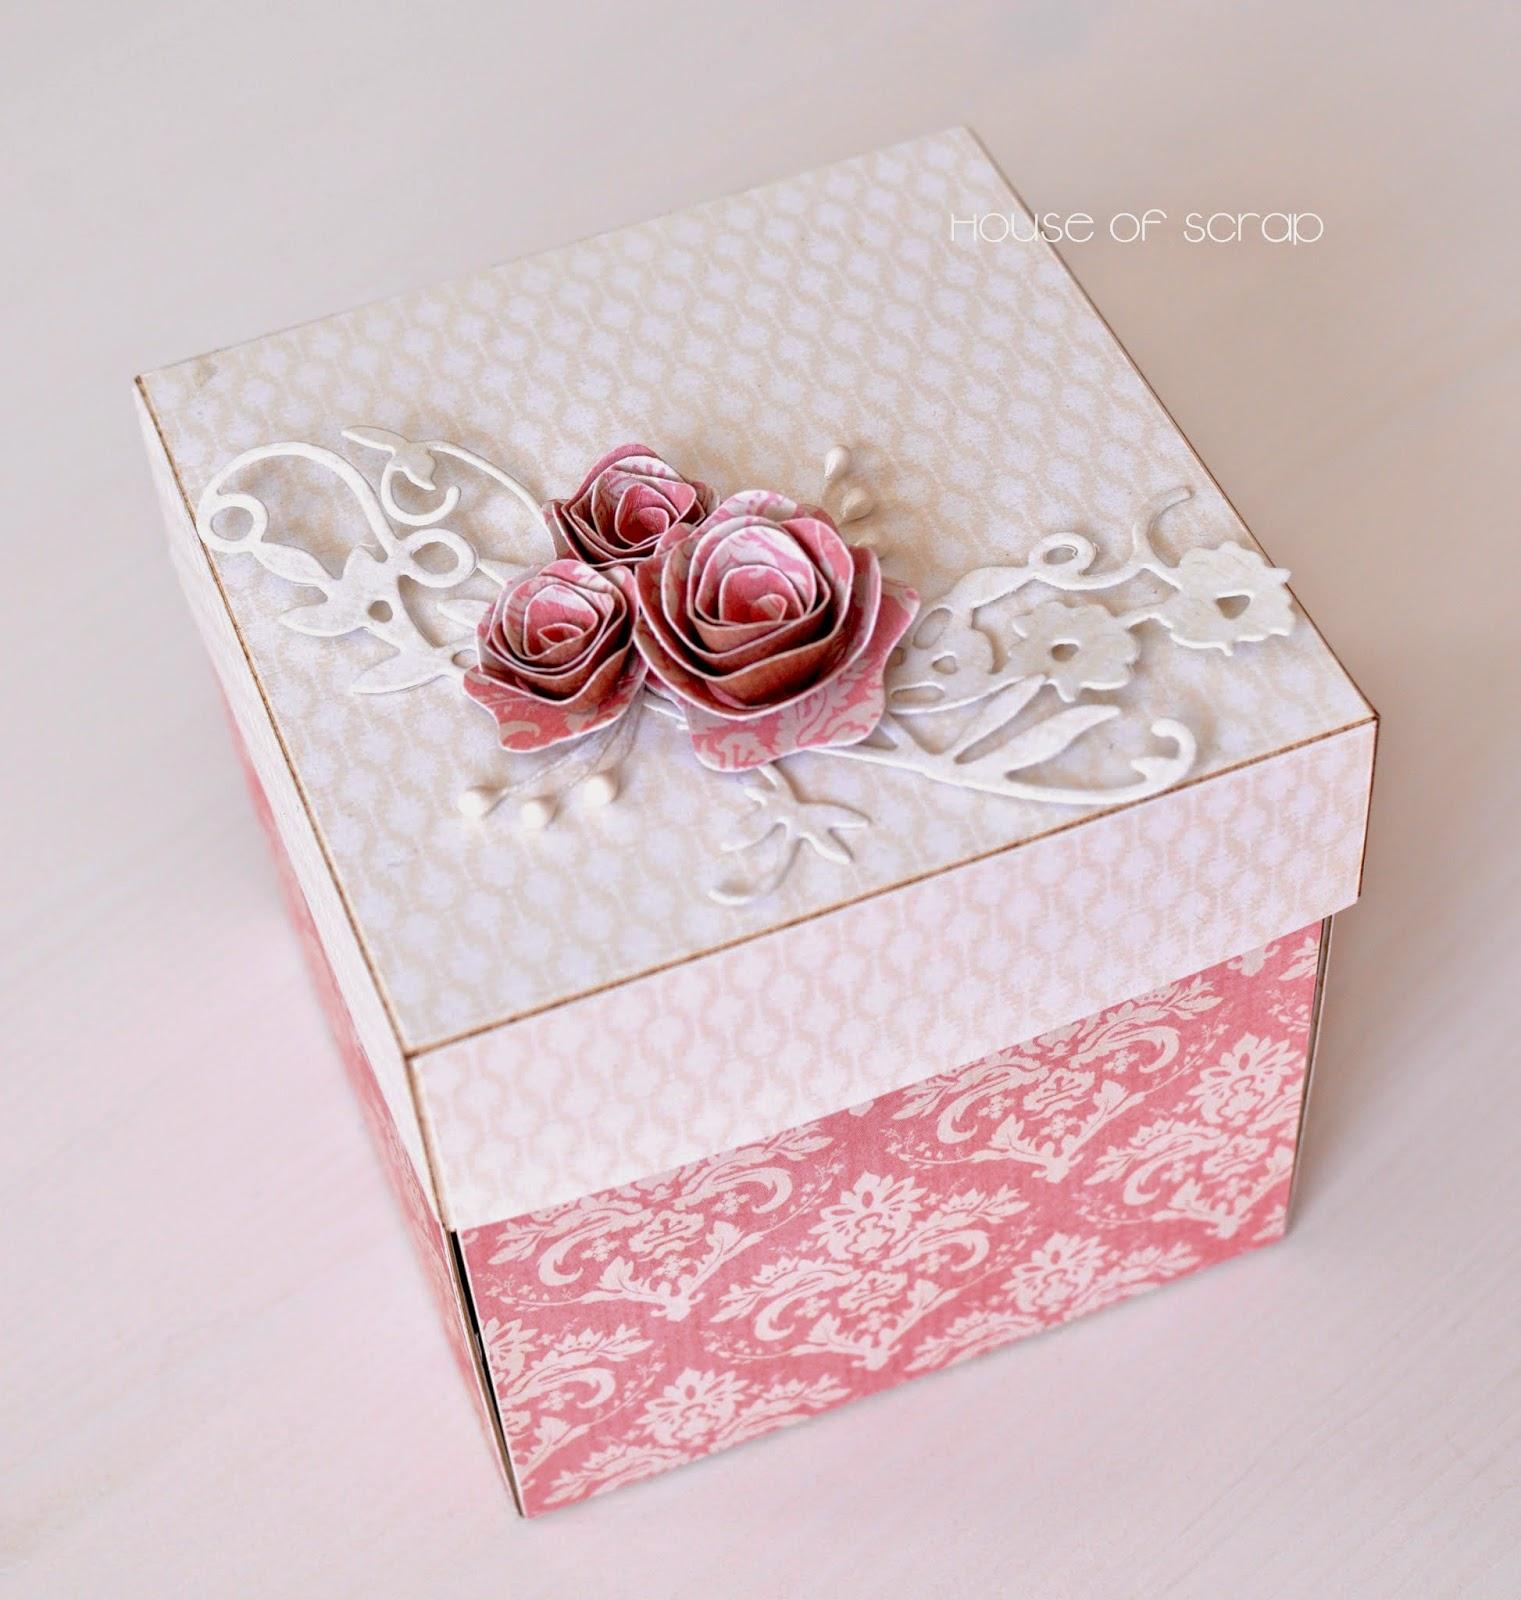 Krabiky na penze Dary pro novomanele - Svatebn